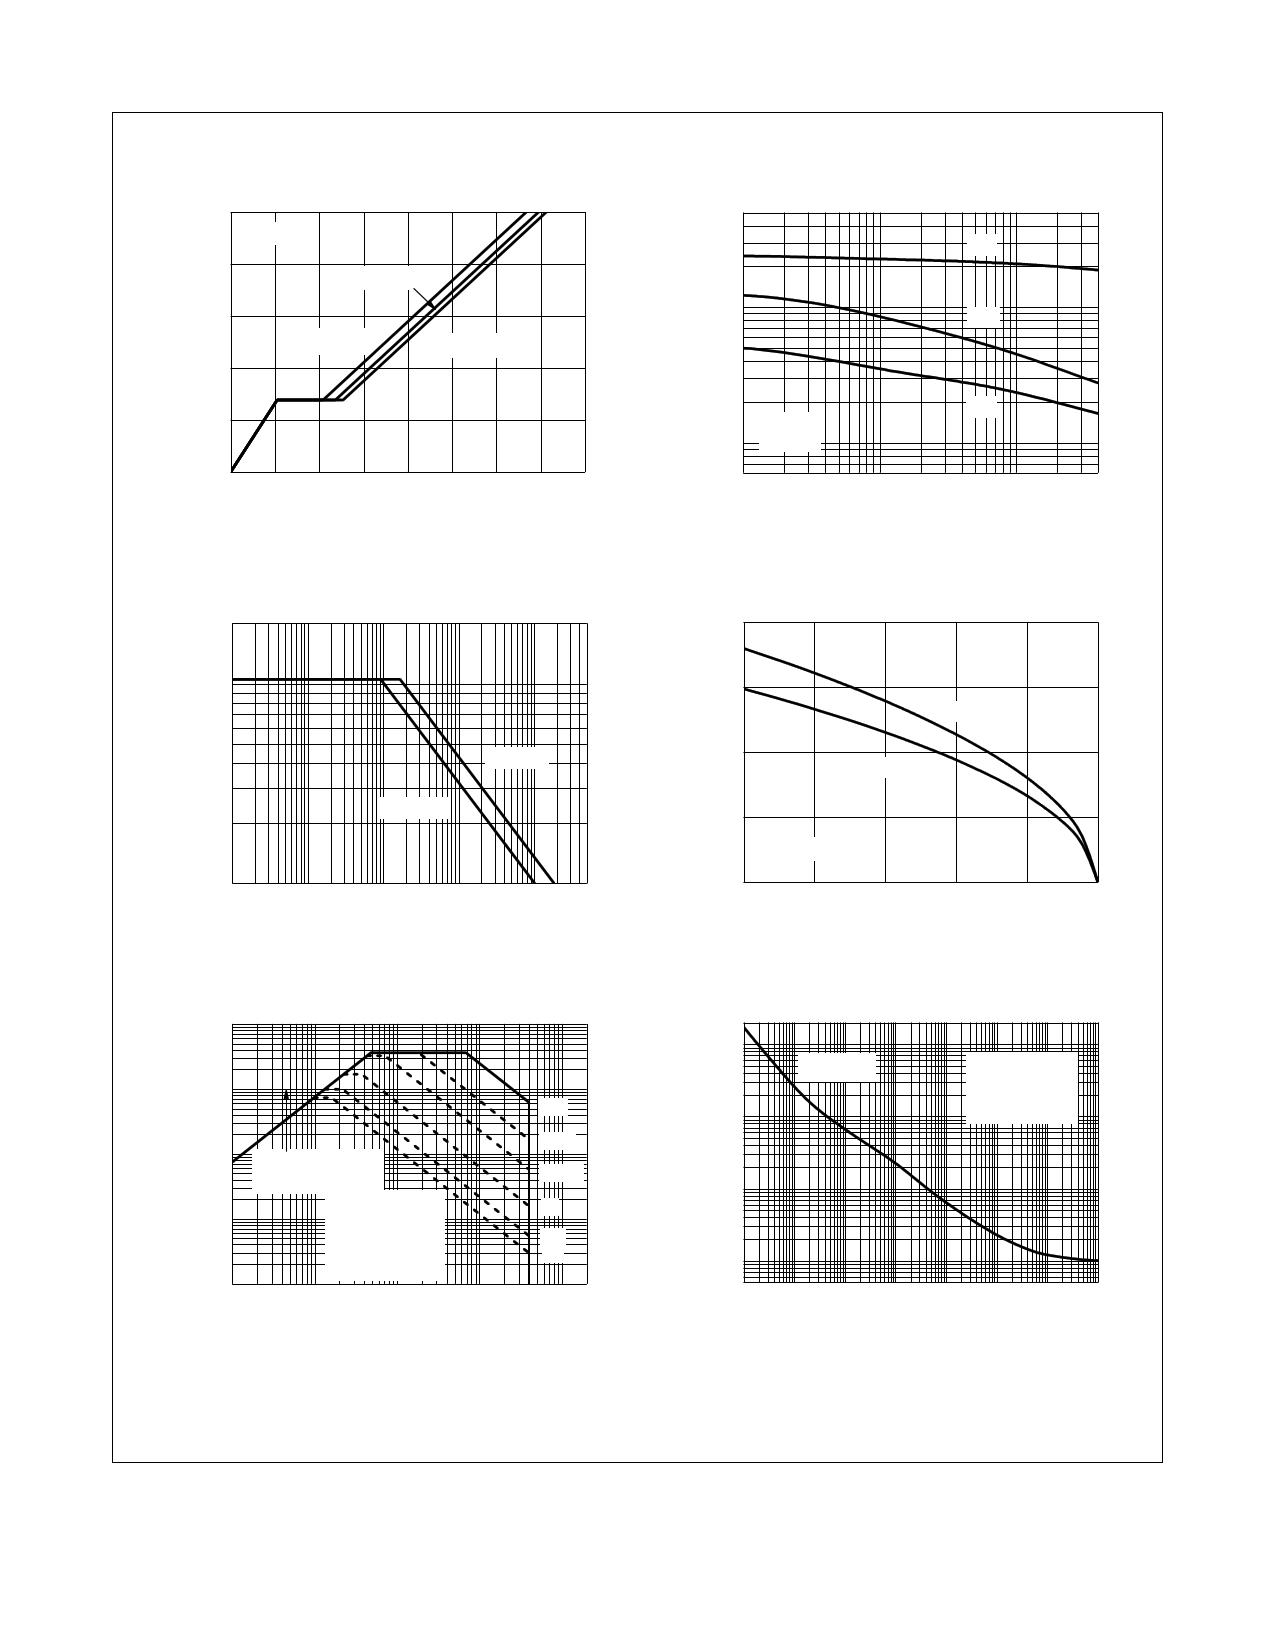 FDS4141 pdf, 반도체, 판매, 대치품